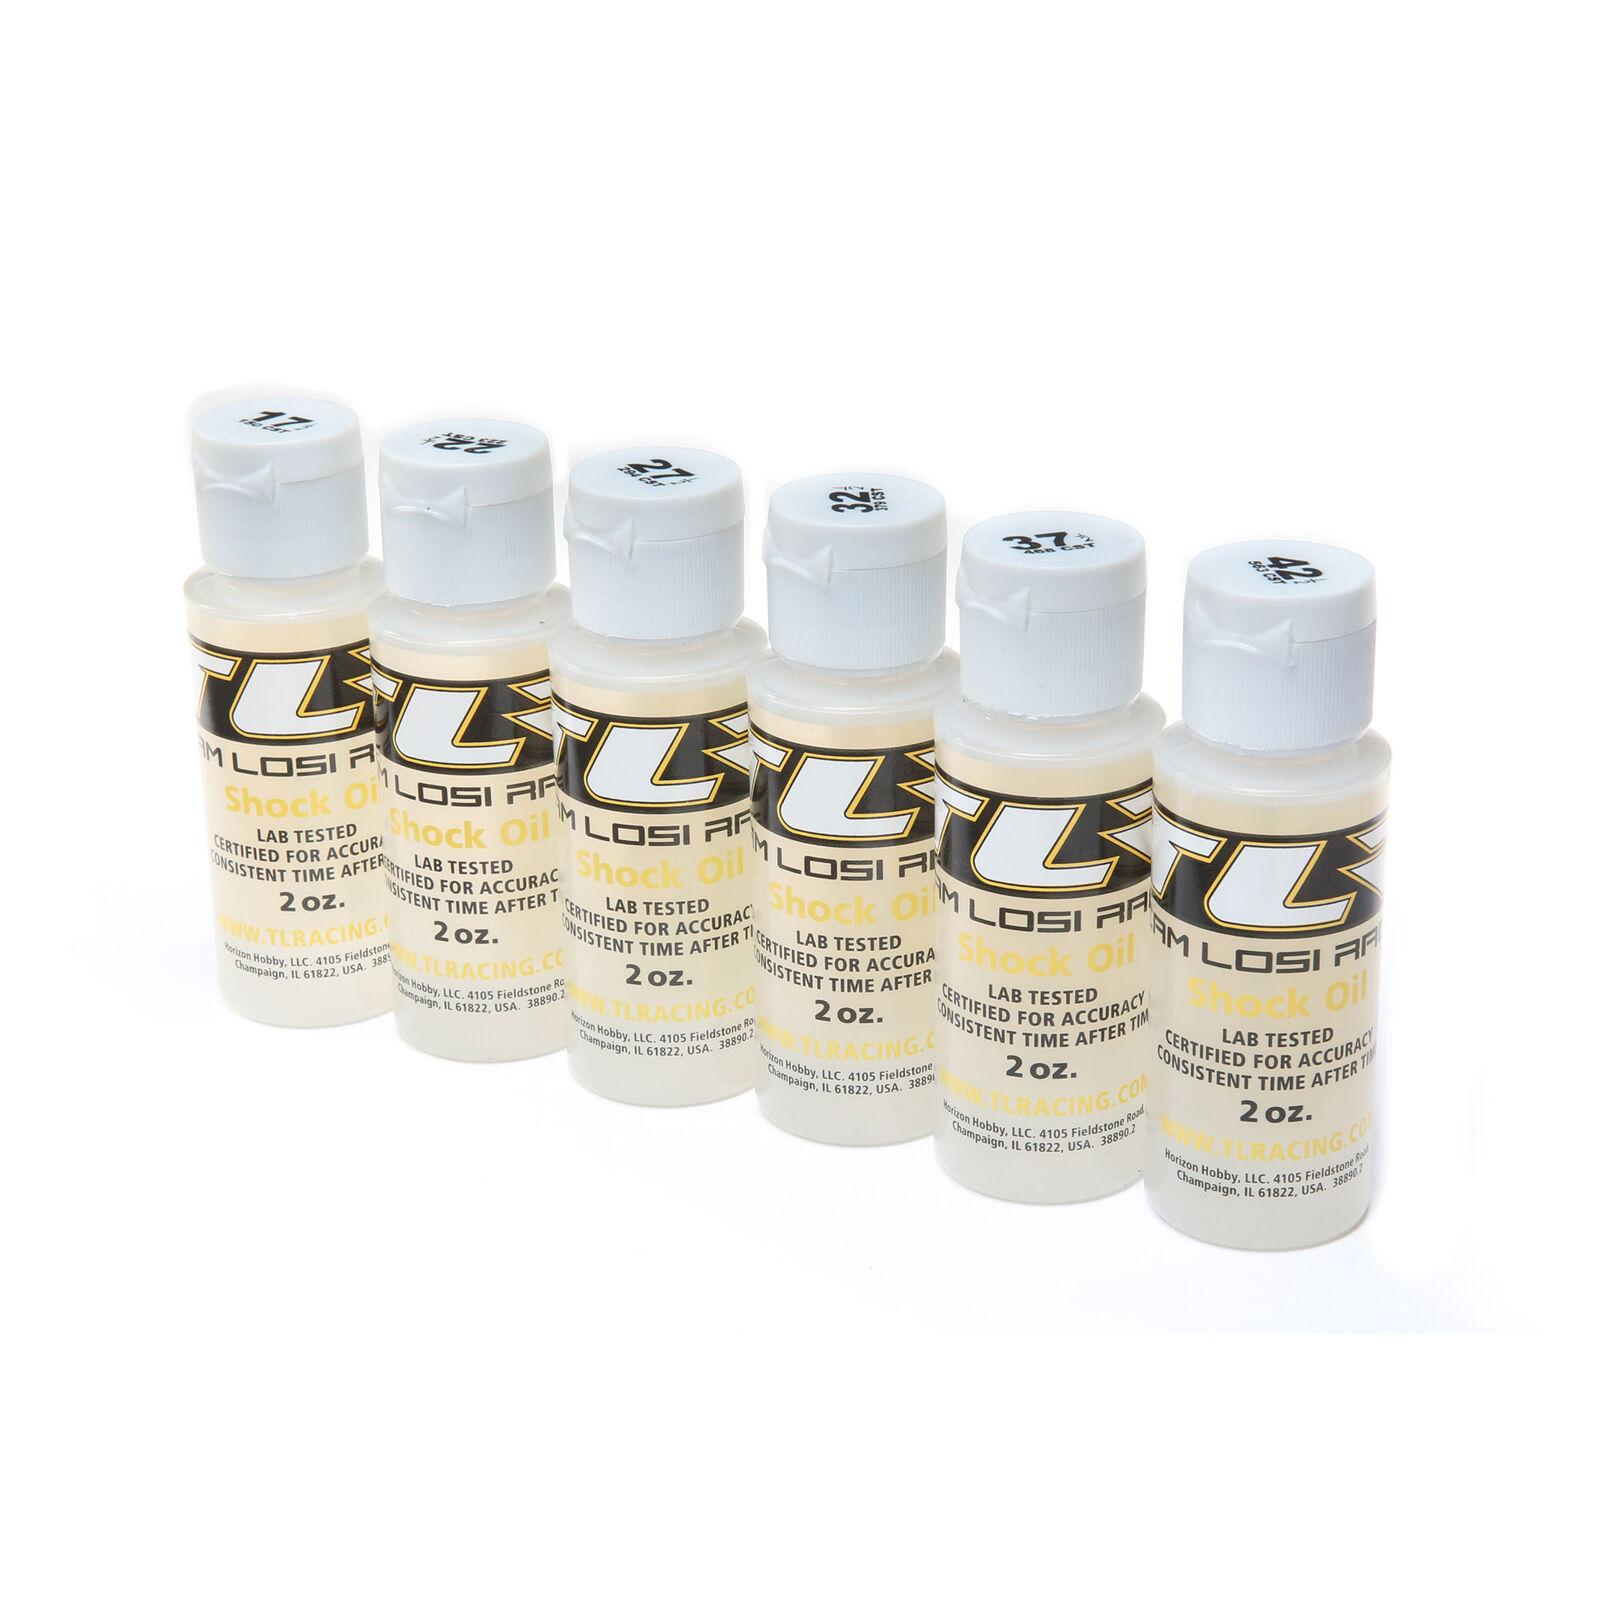 Shock Oil, 6Pk, 17.5, 22.5, 27.5, 32.5, 37.5, 42.5 2oz